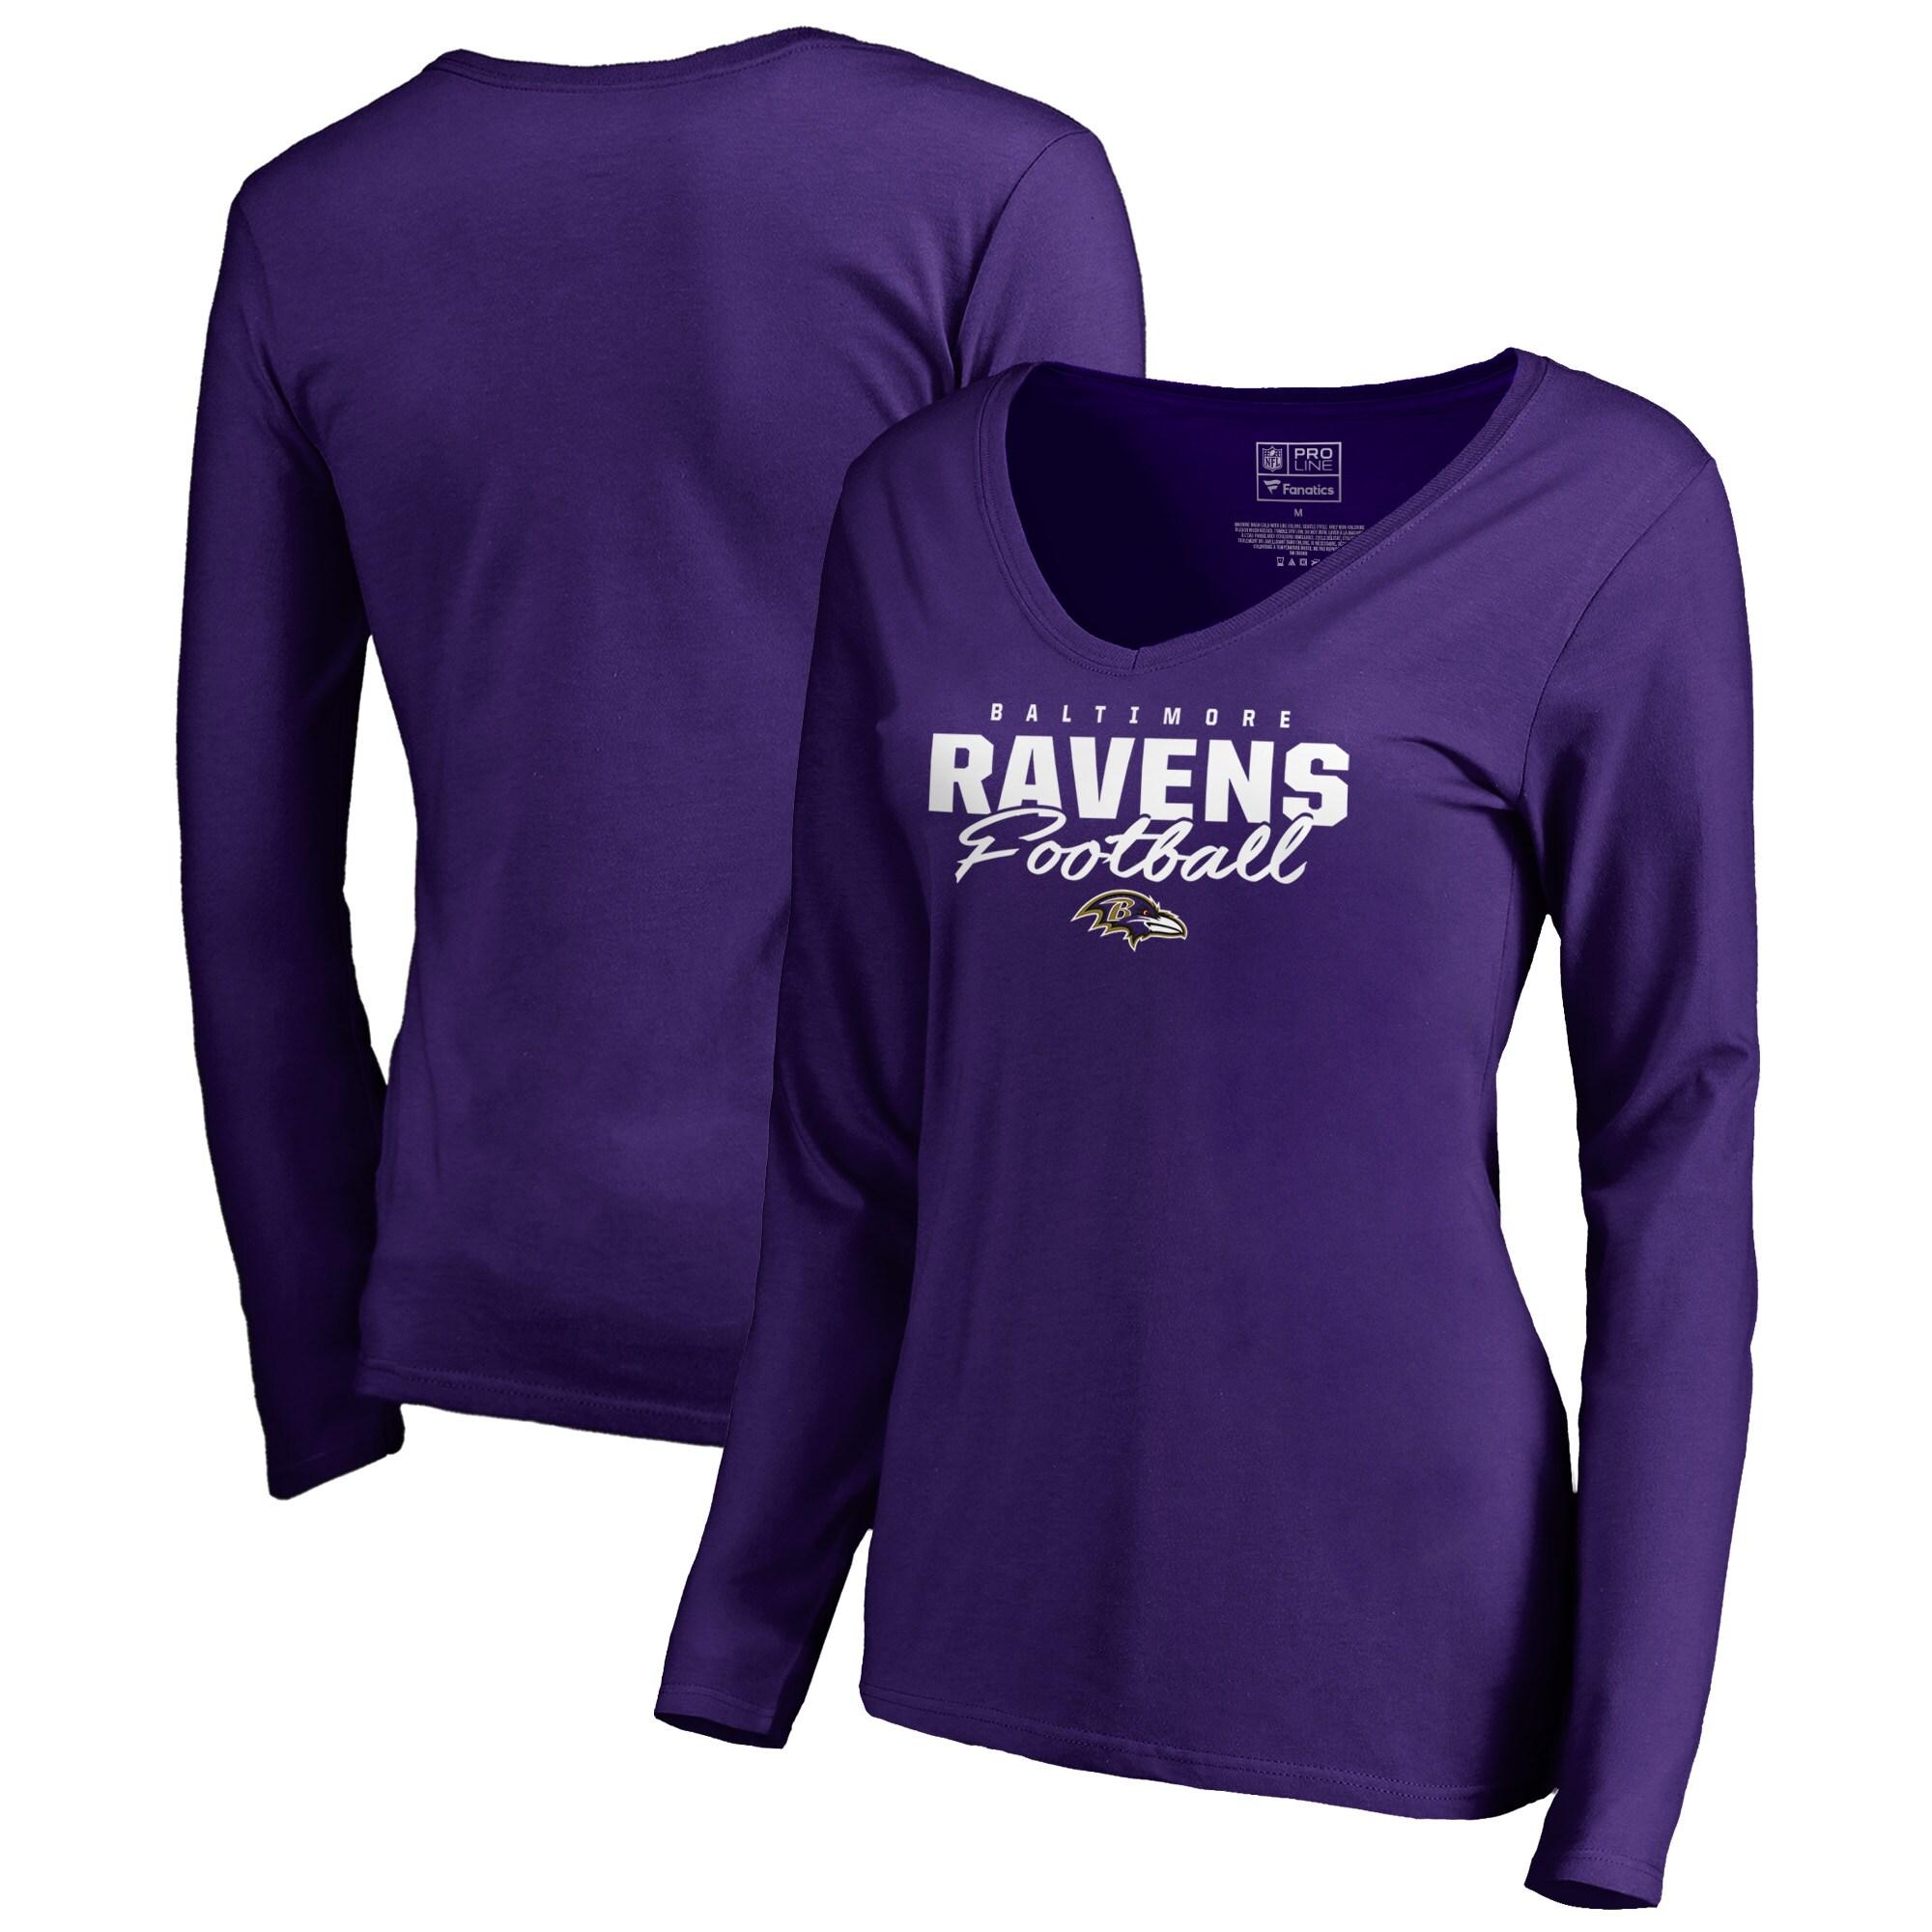 Baltimore Ravens NFL Pro Line by Fanatics Branded Women's Iconic Collection Script Assist Long Sleeve V-Neck T-Shirt - Purple